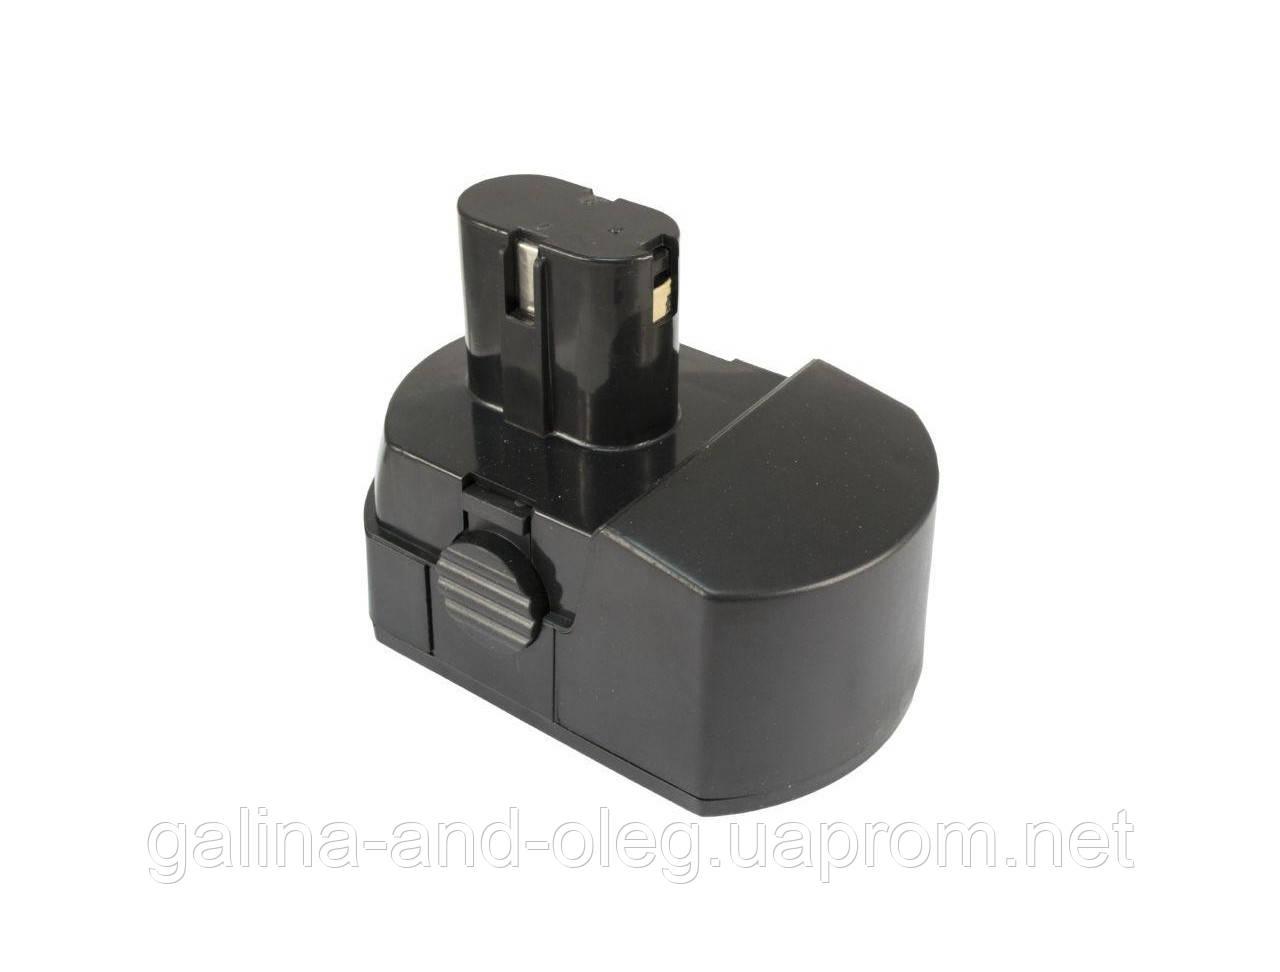 Аккумулятор для шуруповерта ZPL - 18 В, каблкук